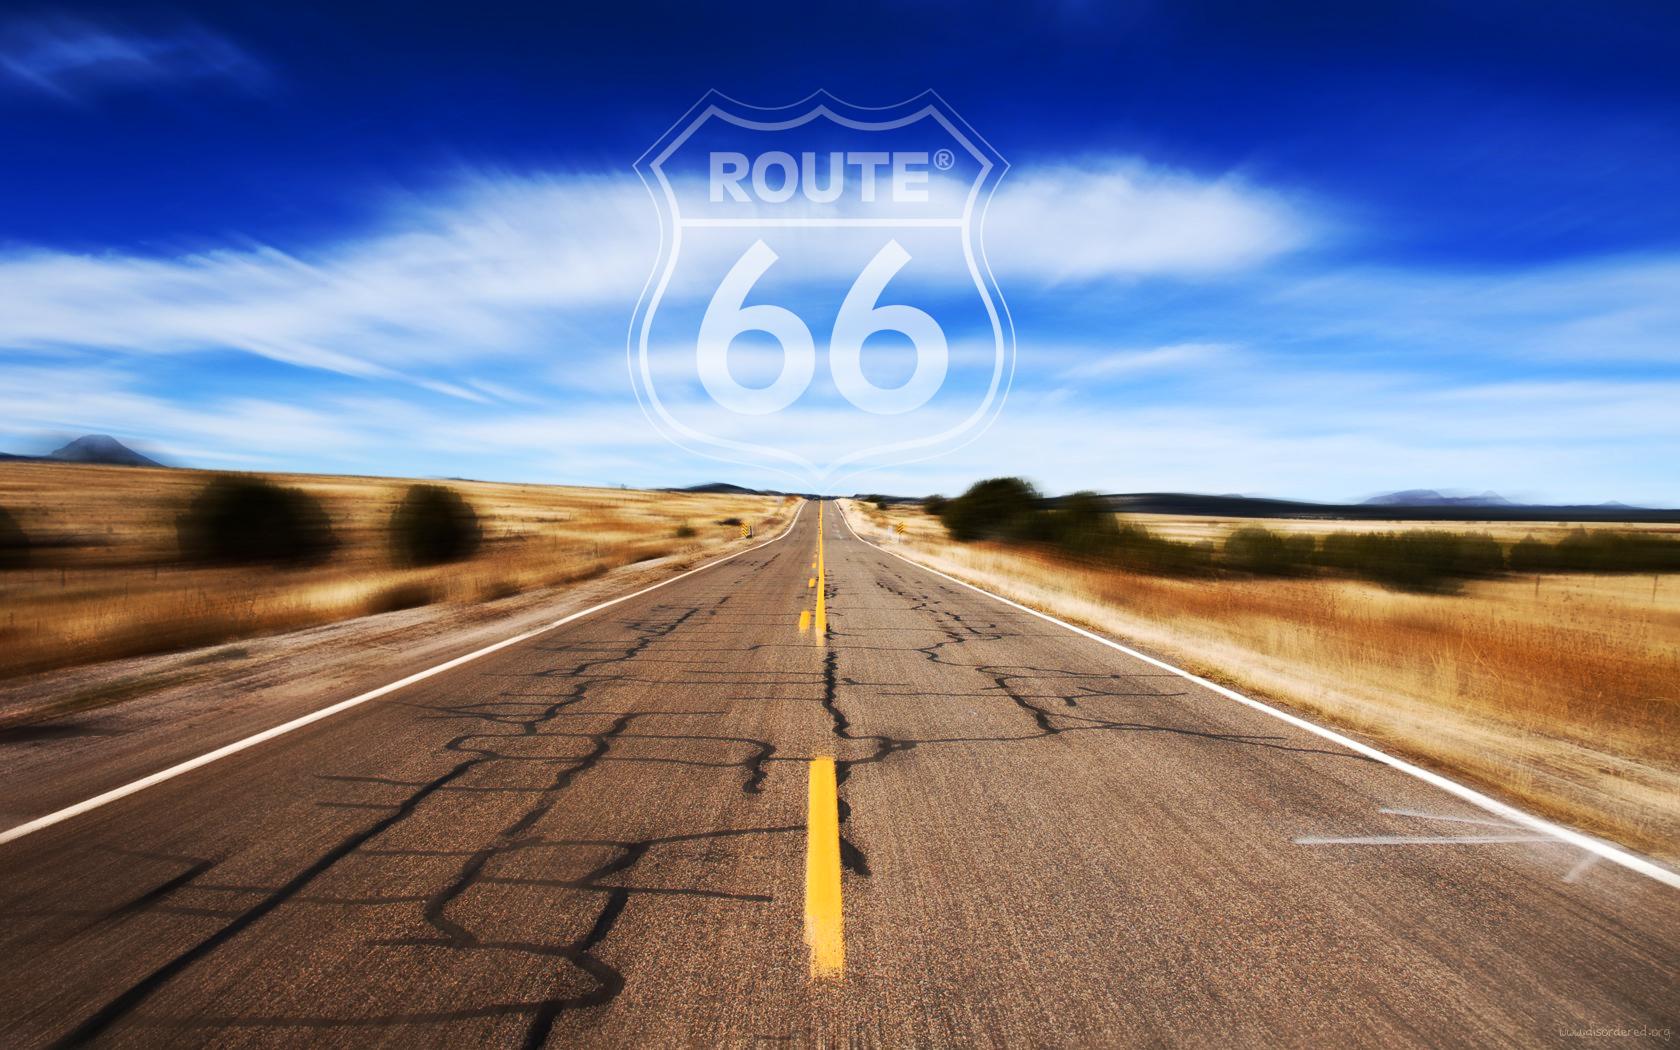 route 66 wallpaper hd - photo #20